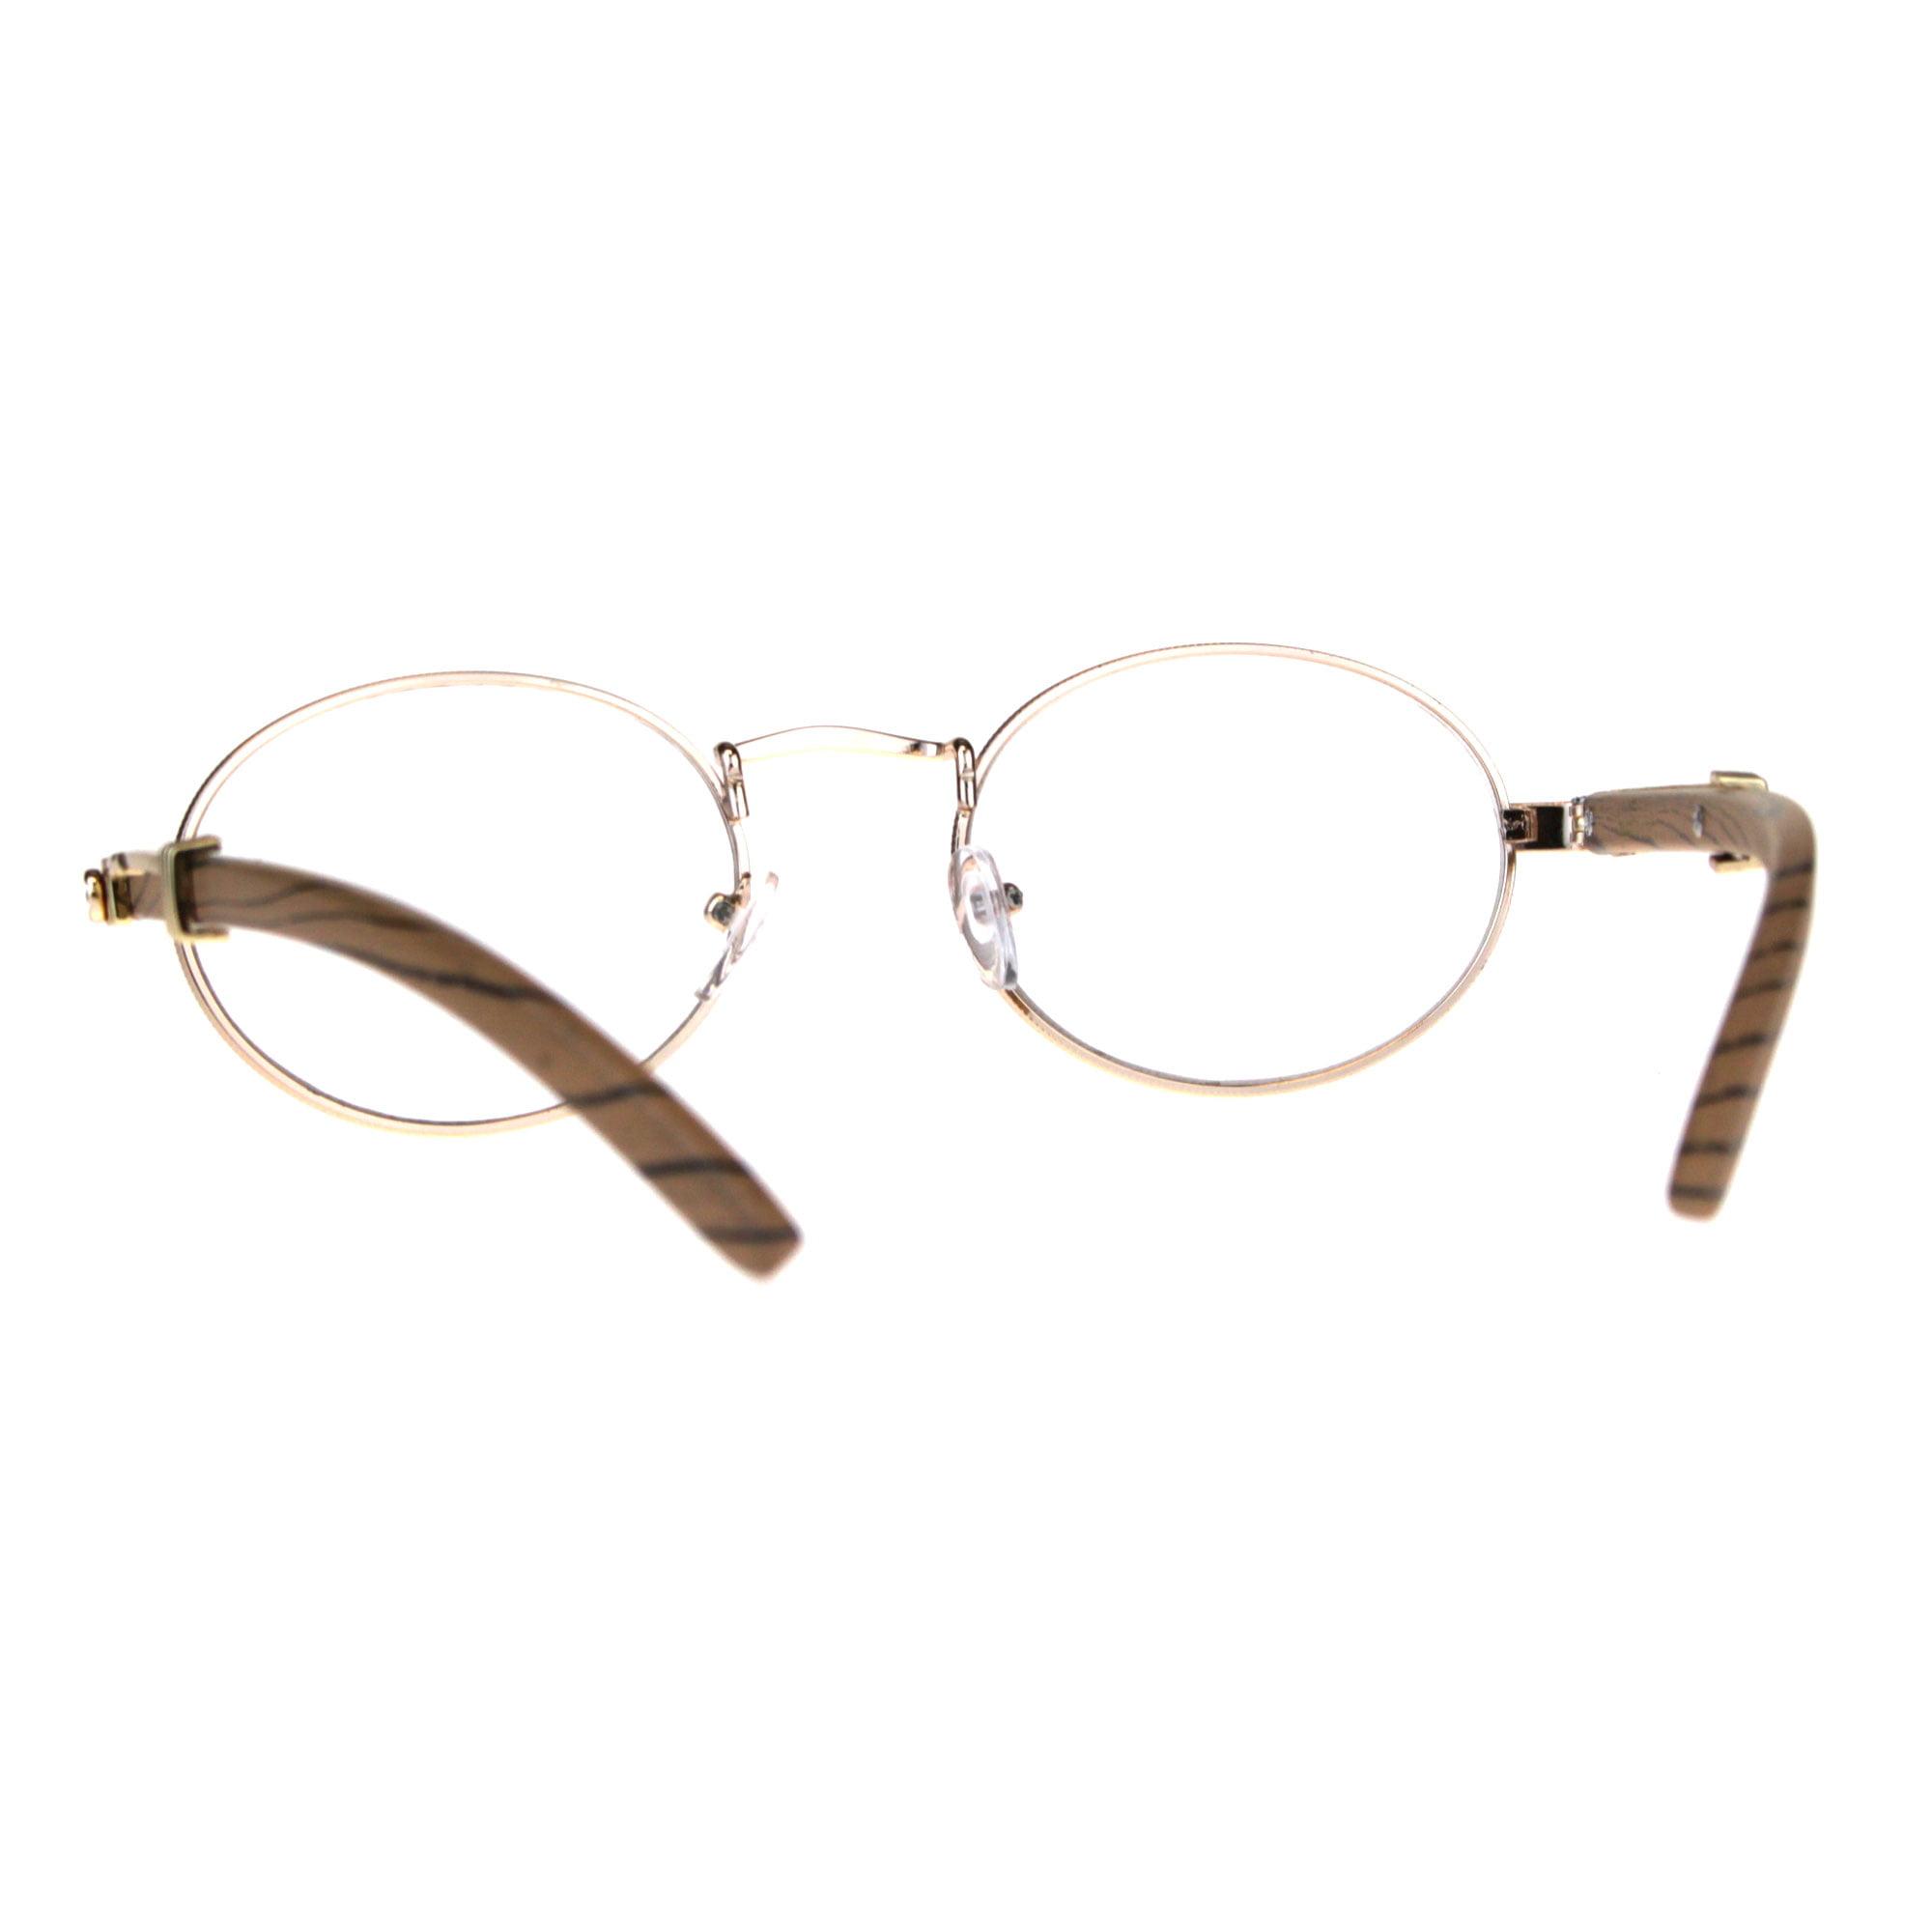 d1dfe0301b3d Mens OG 90s Hip Hop Rapper Luxury Metal Rim Victorian Eyeglasses Light Gold  - Walmart.com